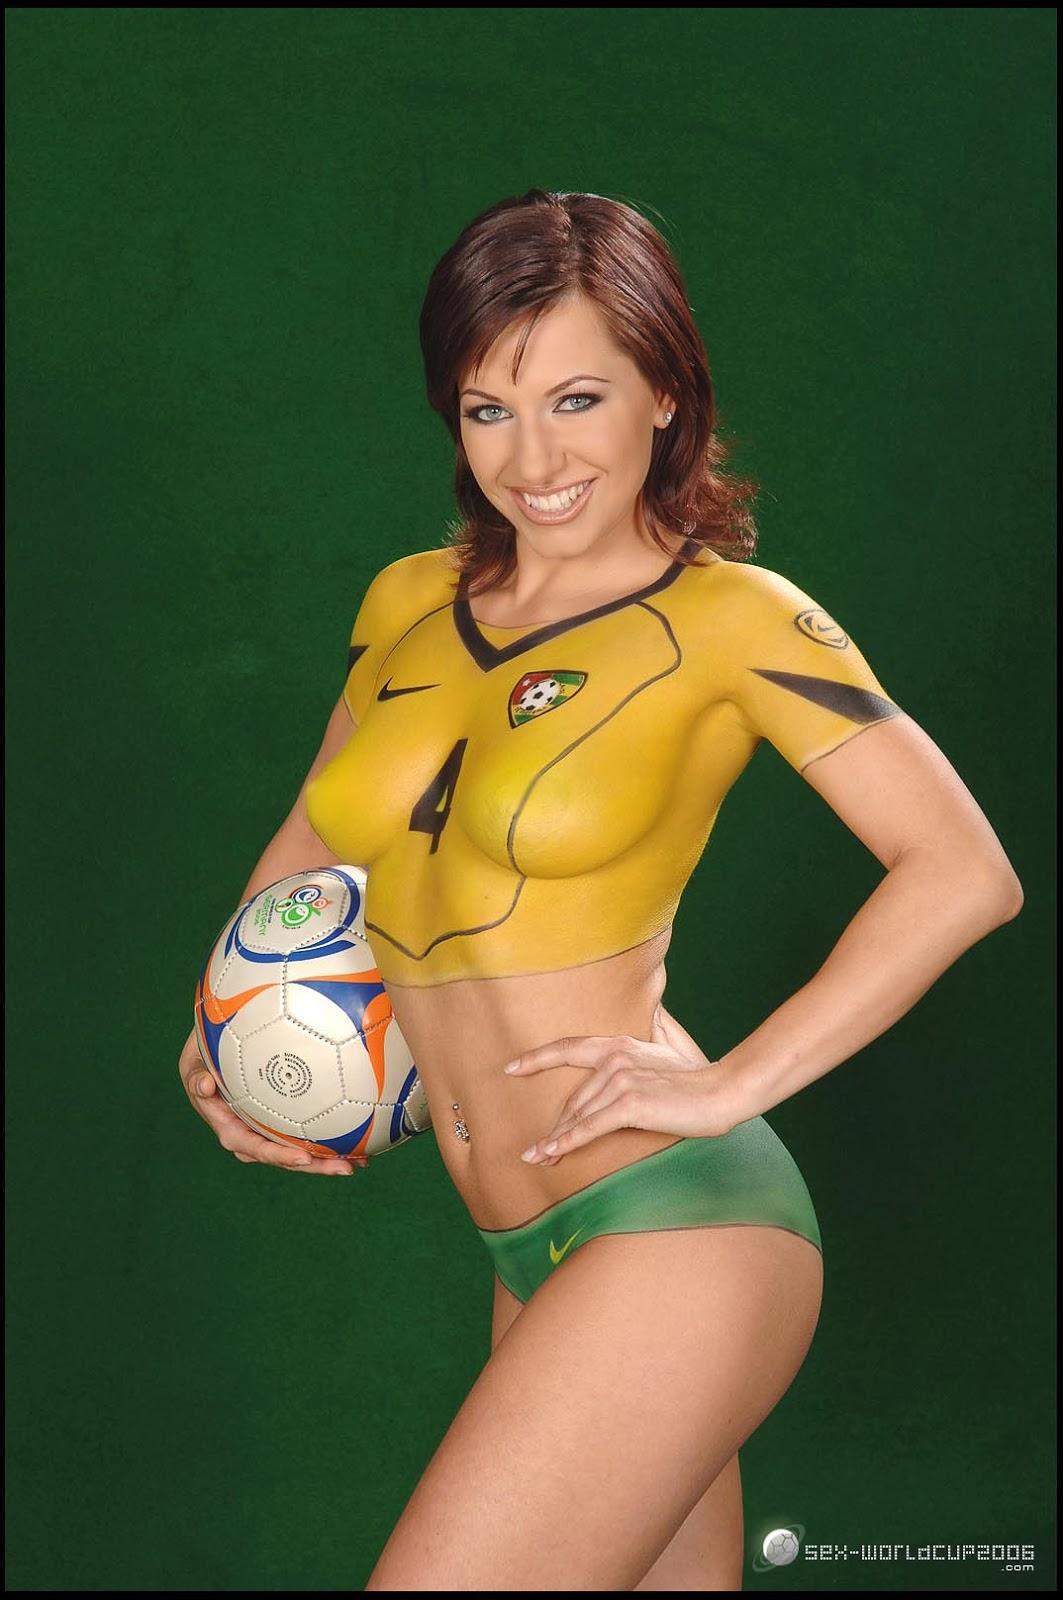 Best Body Painting: Soccer Body Paint Women